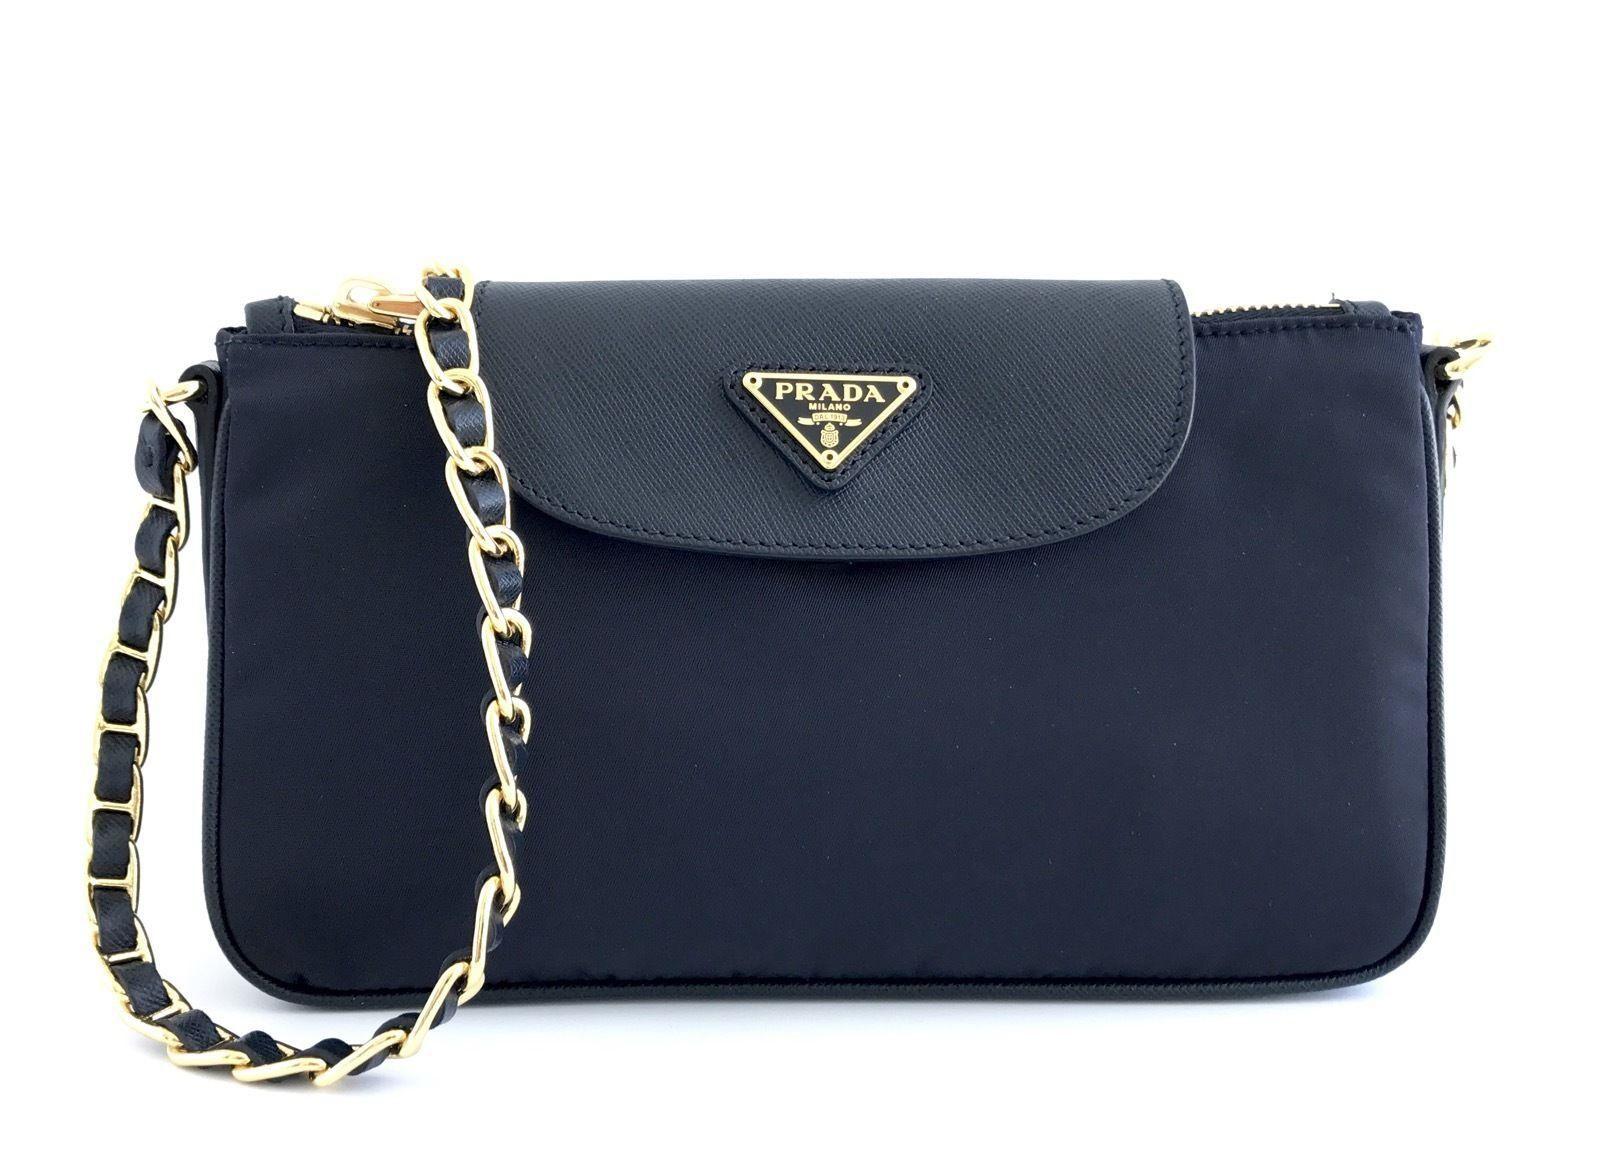 04b7891d169b Prada Chain Strap Nylon Navy Blue Cross Body Bag. Get the trendiest Cross  Body Bag